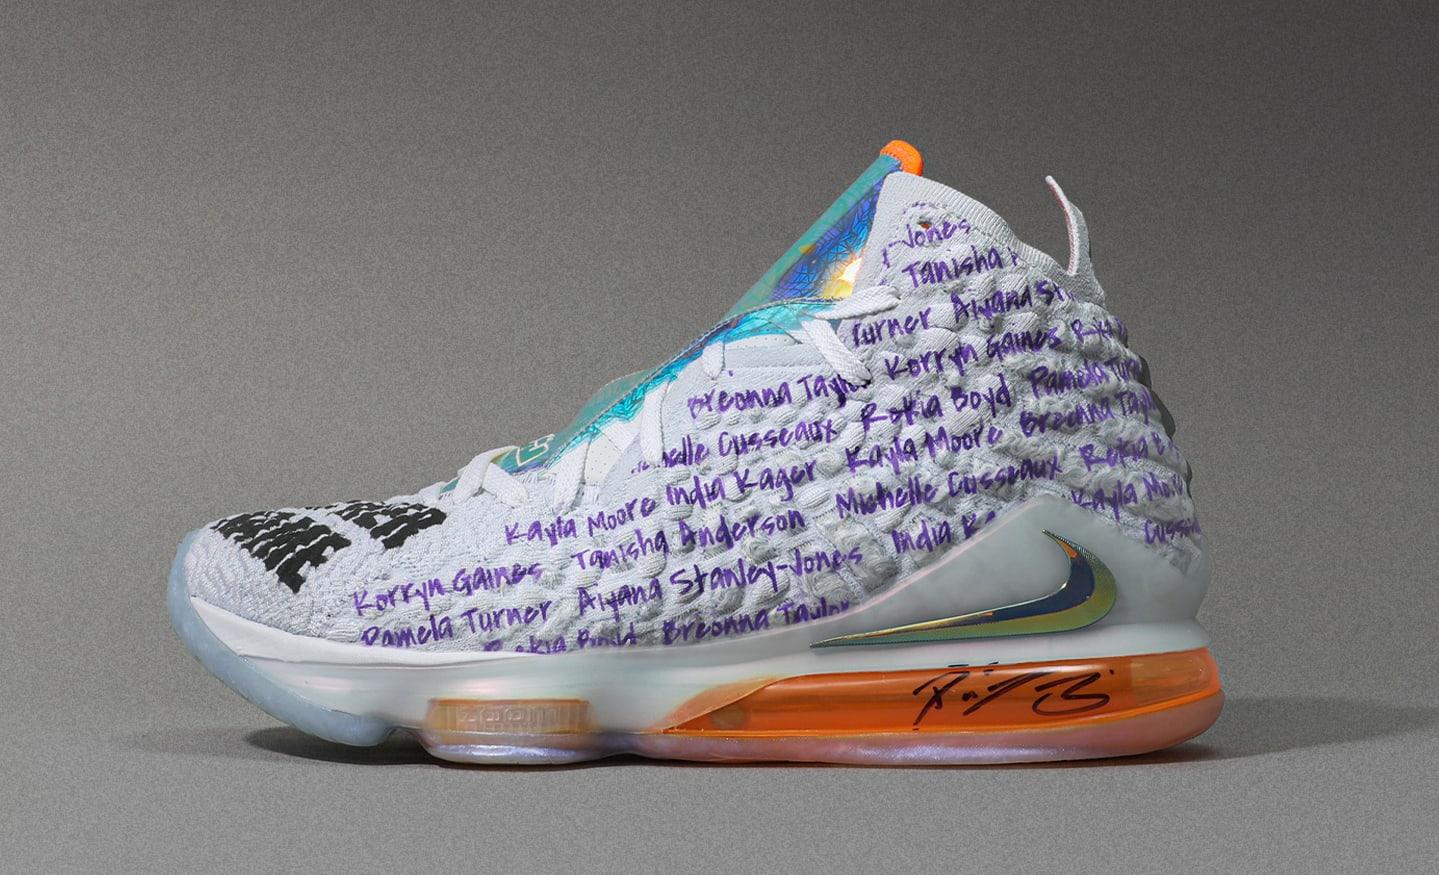 Diana Taurasi Nike LeBron 17 Custom Lateral